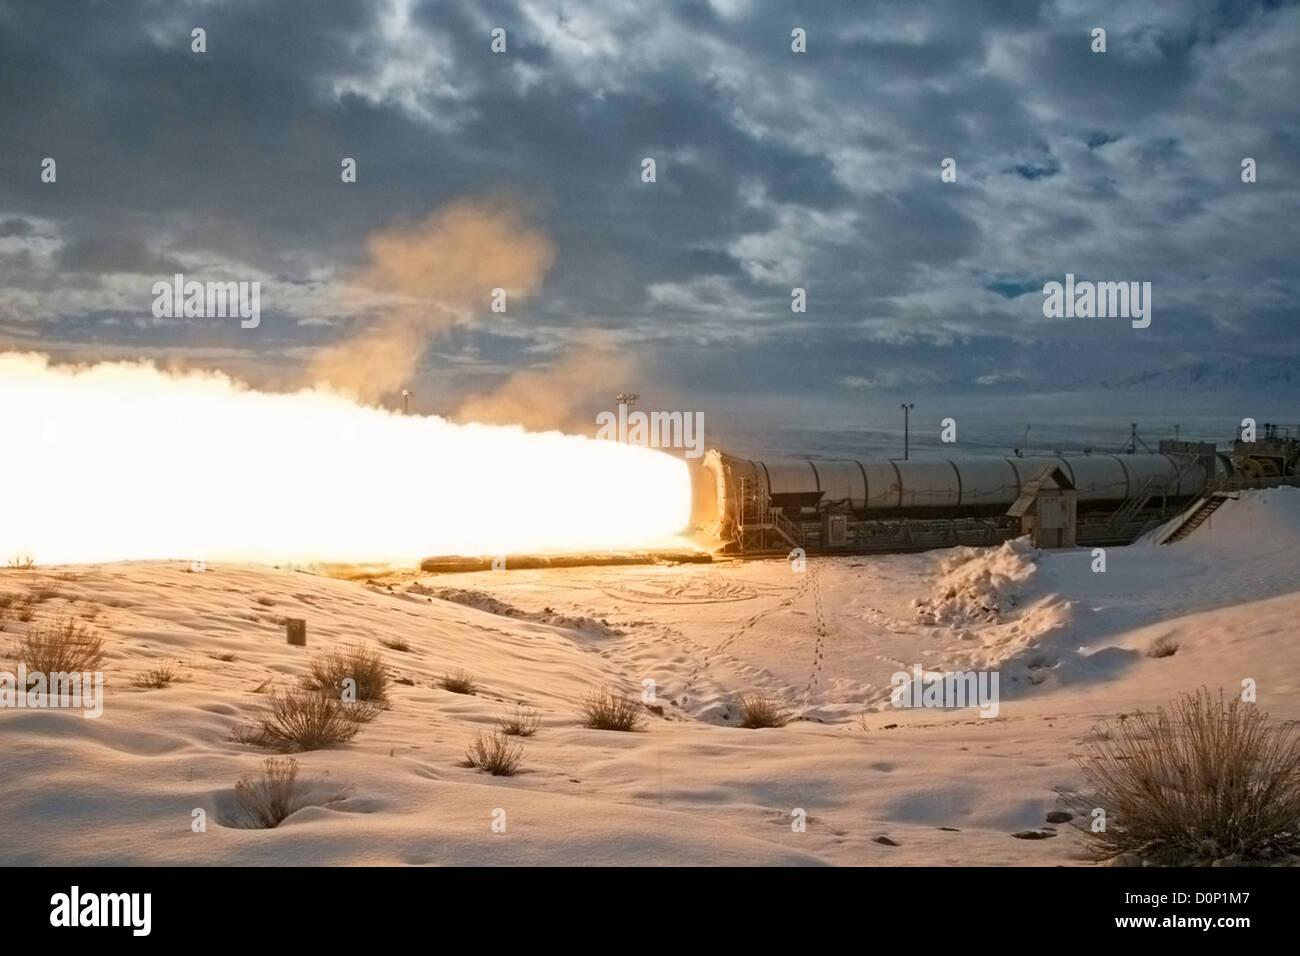 Final Test Firing of a Reusable Solid Rocket Motor - Stock Image